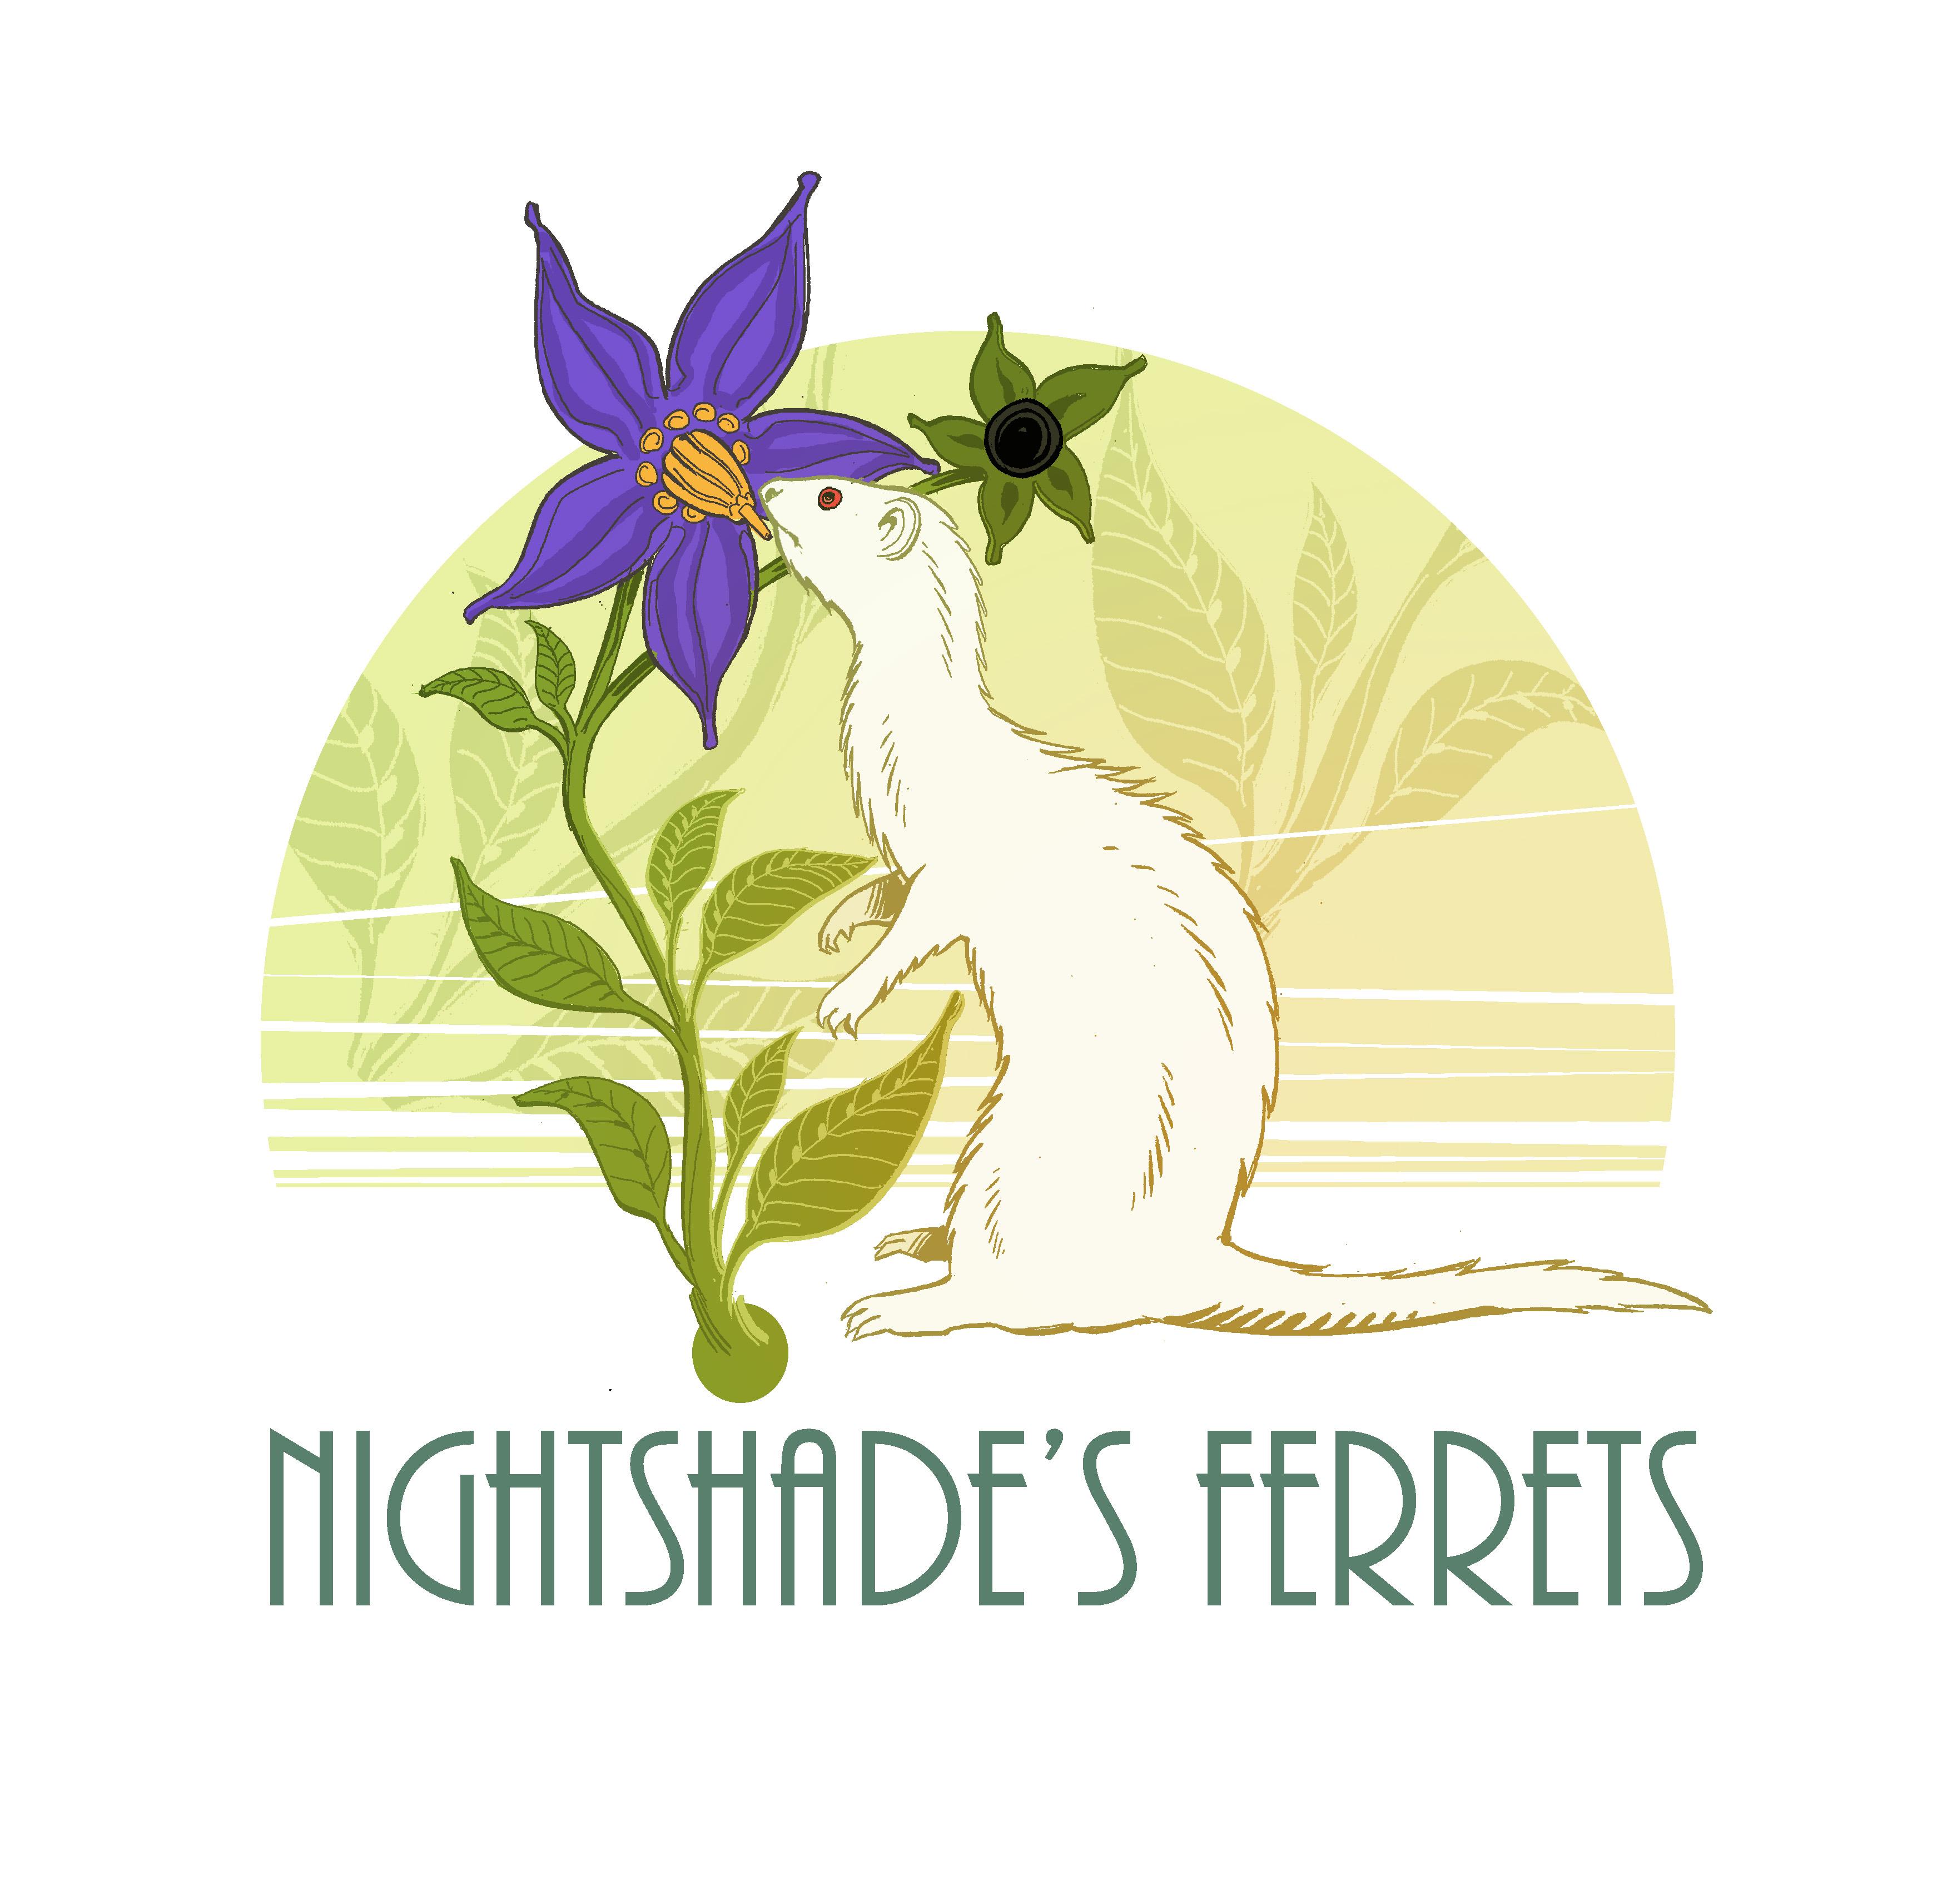 Nightshade's